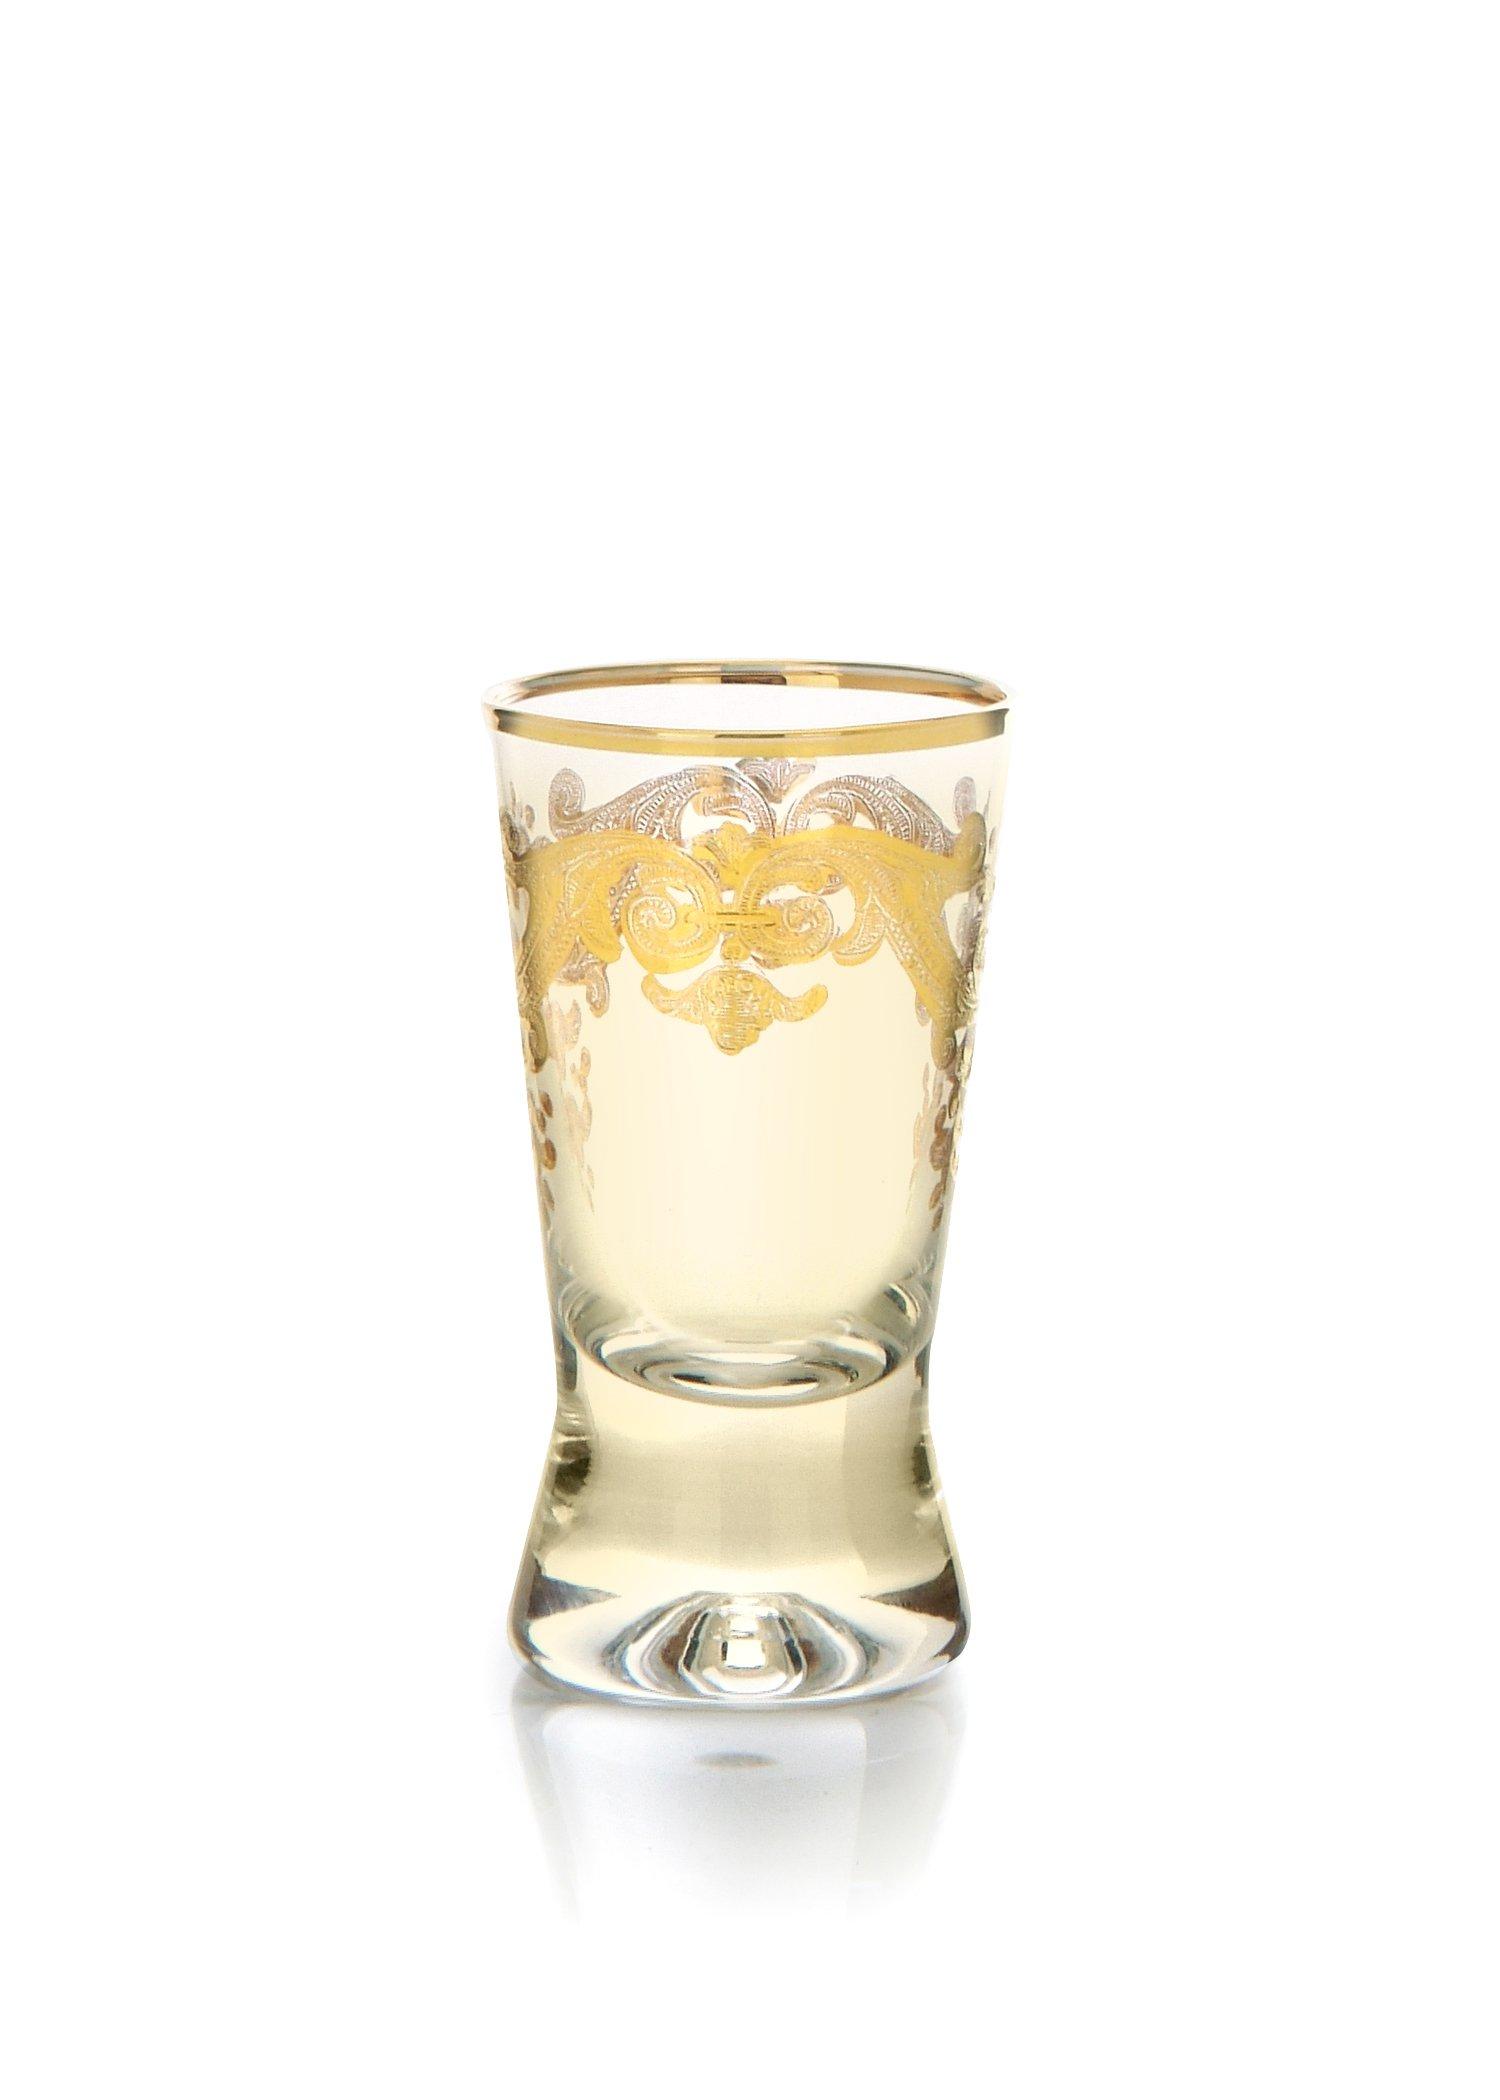 Set 6 Amber Crystal Liqueur Glasses W Rich 24k Gold Artwork 2.75''h X 1.25''w